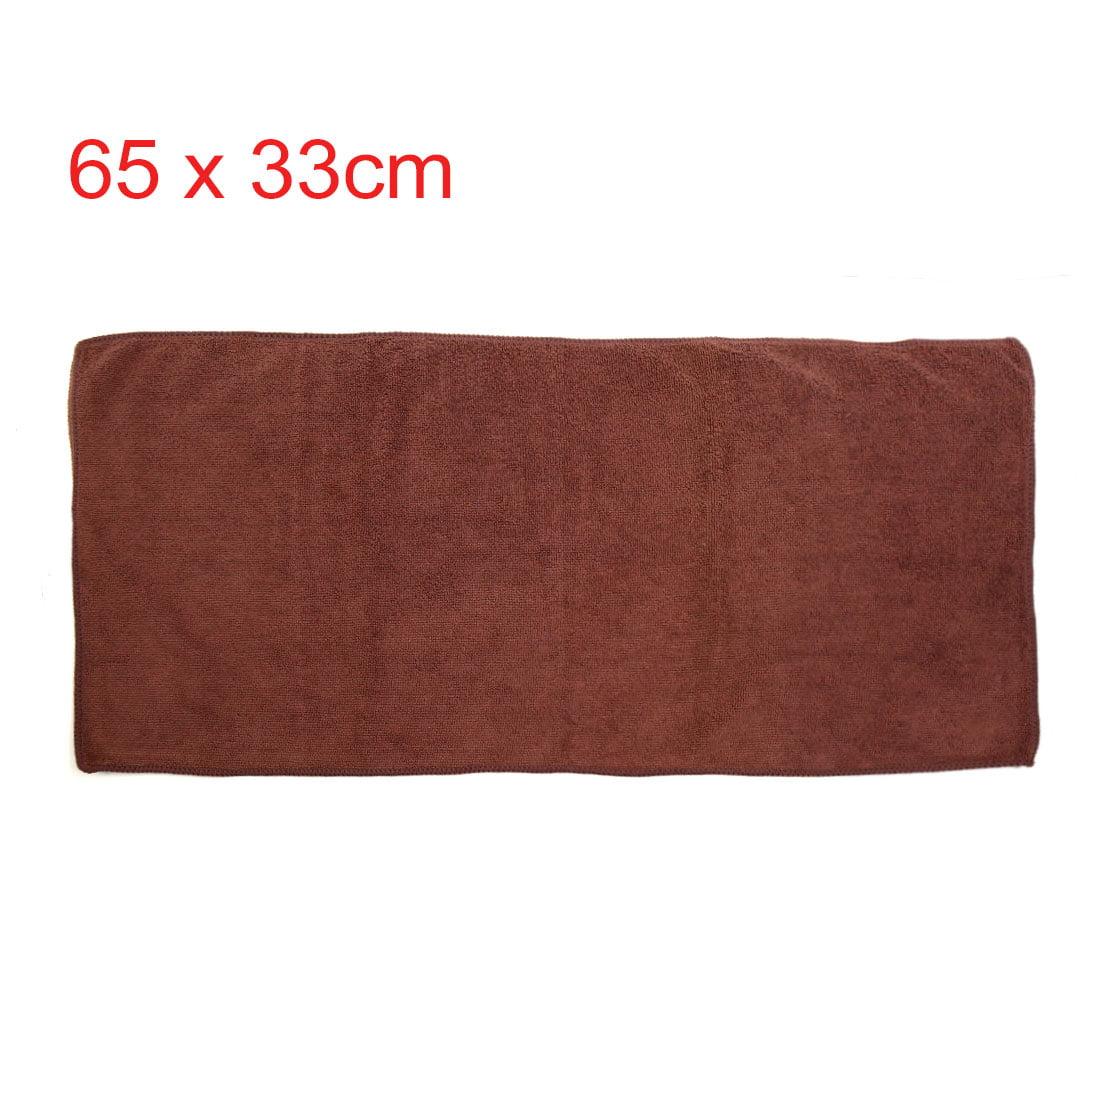 Auto Washing Towels 3pcs 300gsm 65 x 33cm Dark Light Blue Coffee Color Water Absorb Car Clean Towel - image 6 de 7